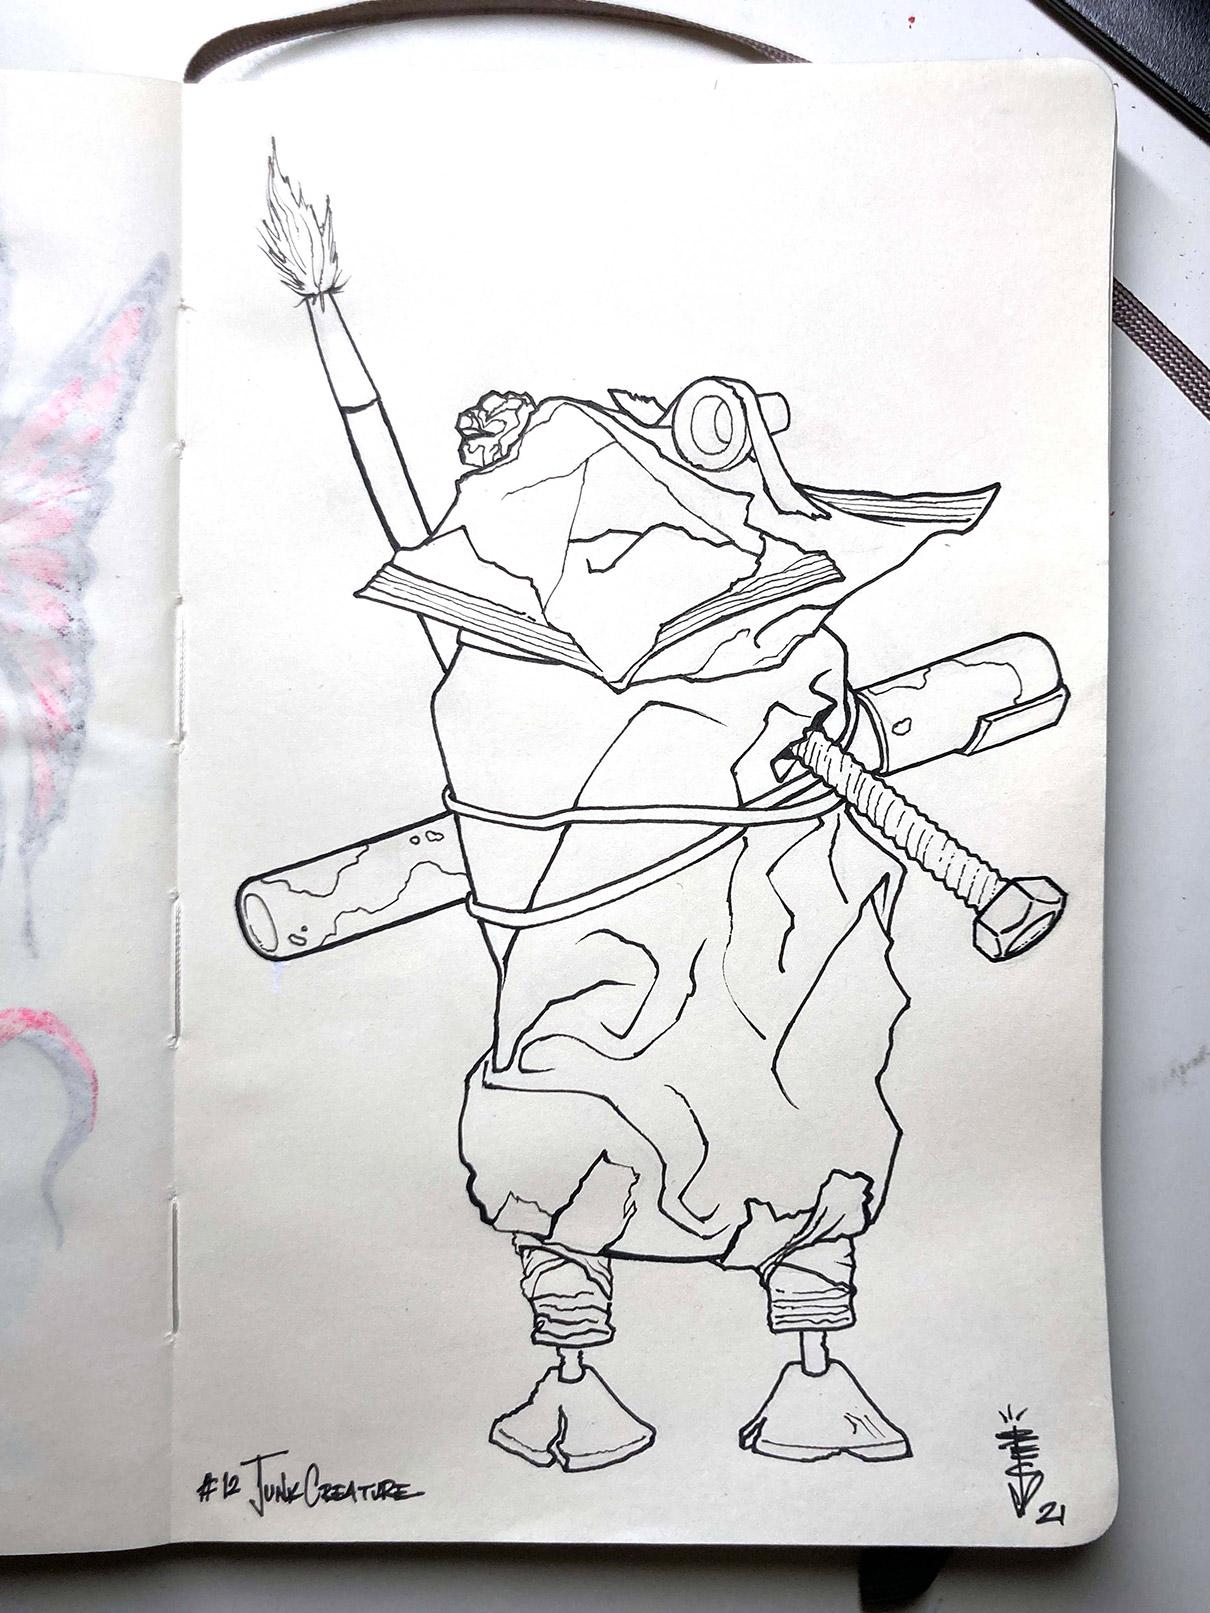 https://bulletonastring.com/wp-content/uploads/2021/03/12_junk_creature_bulletonastring_sketch.jpg